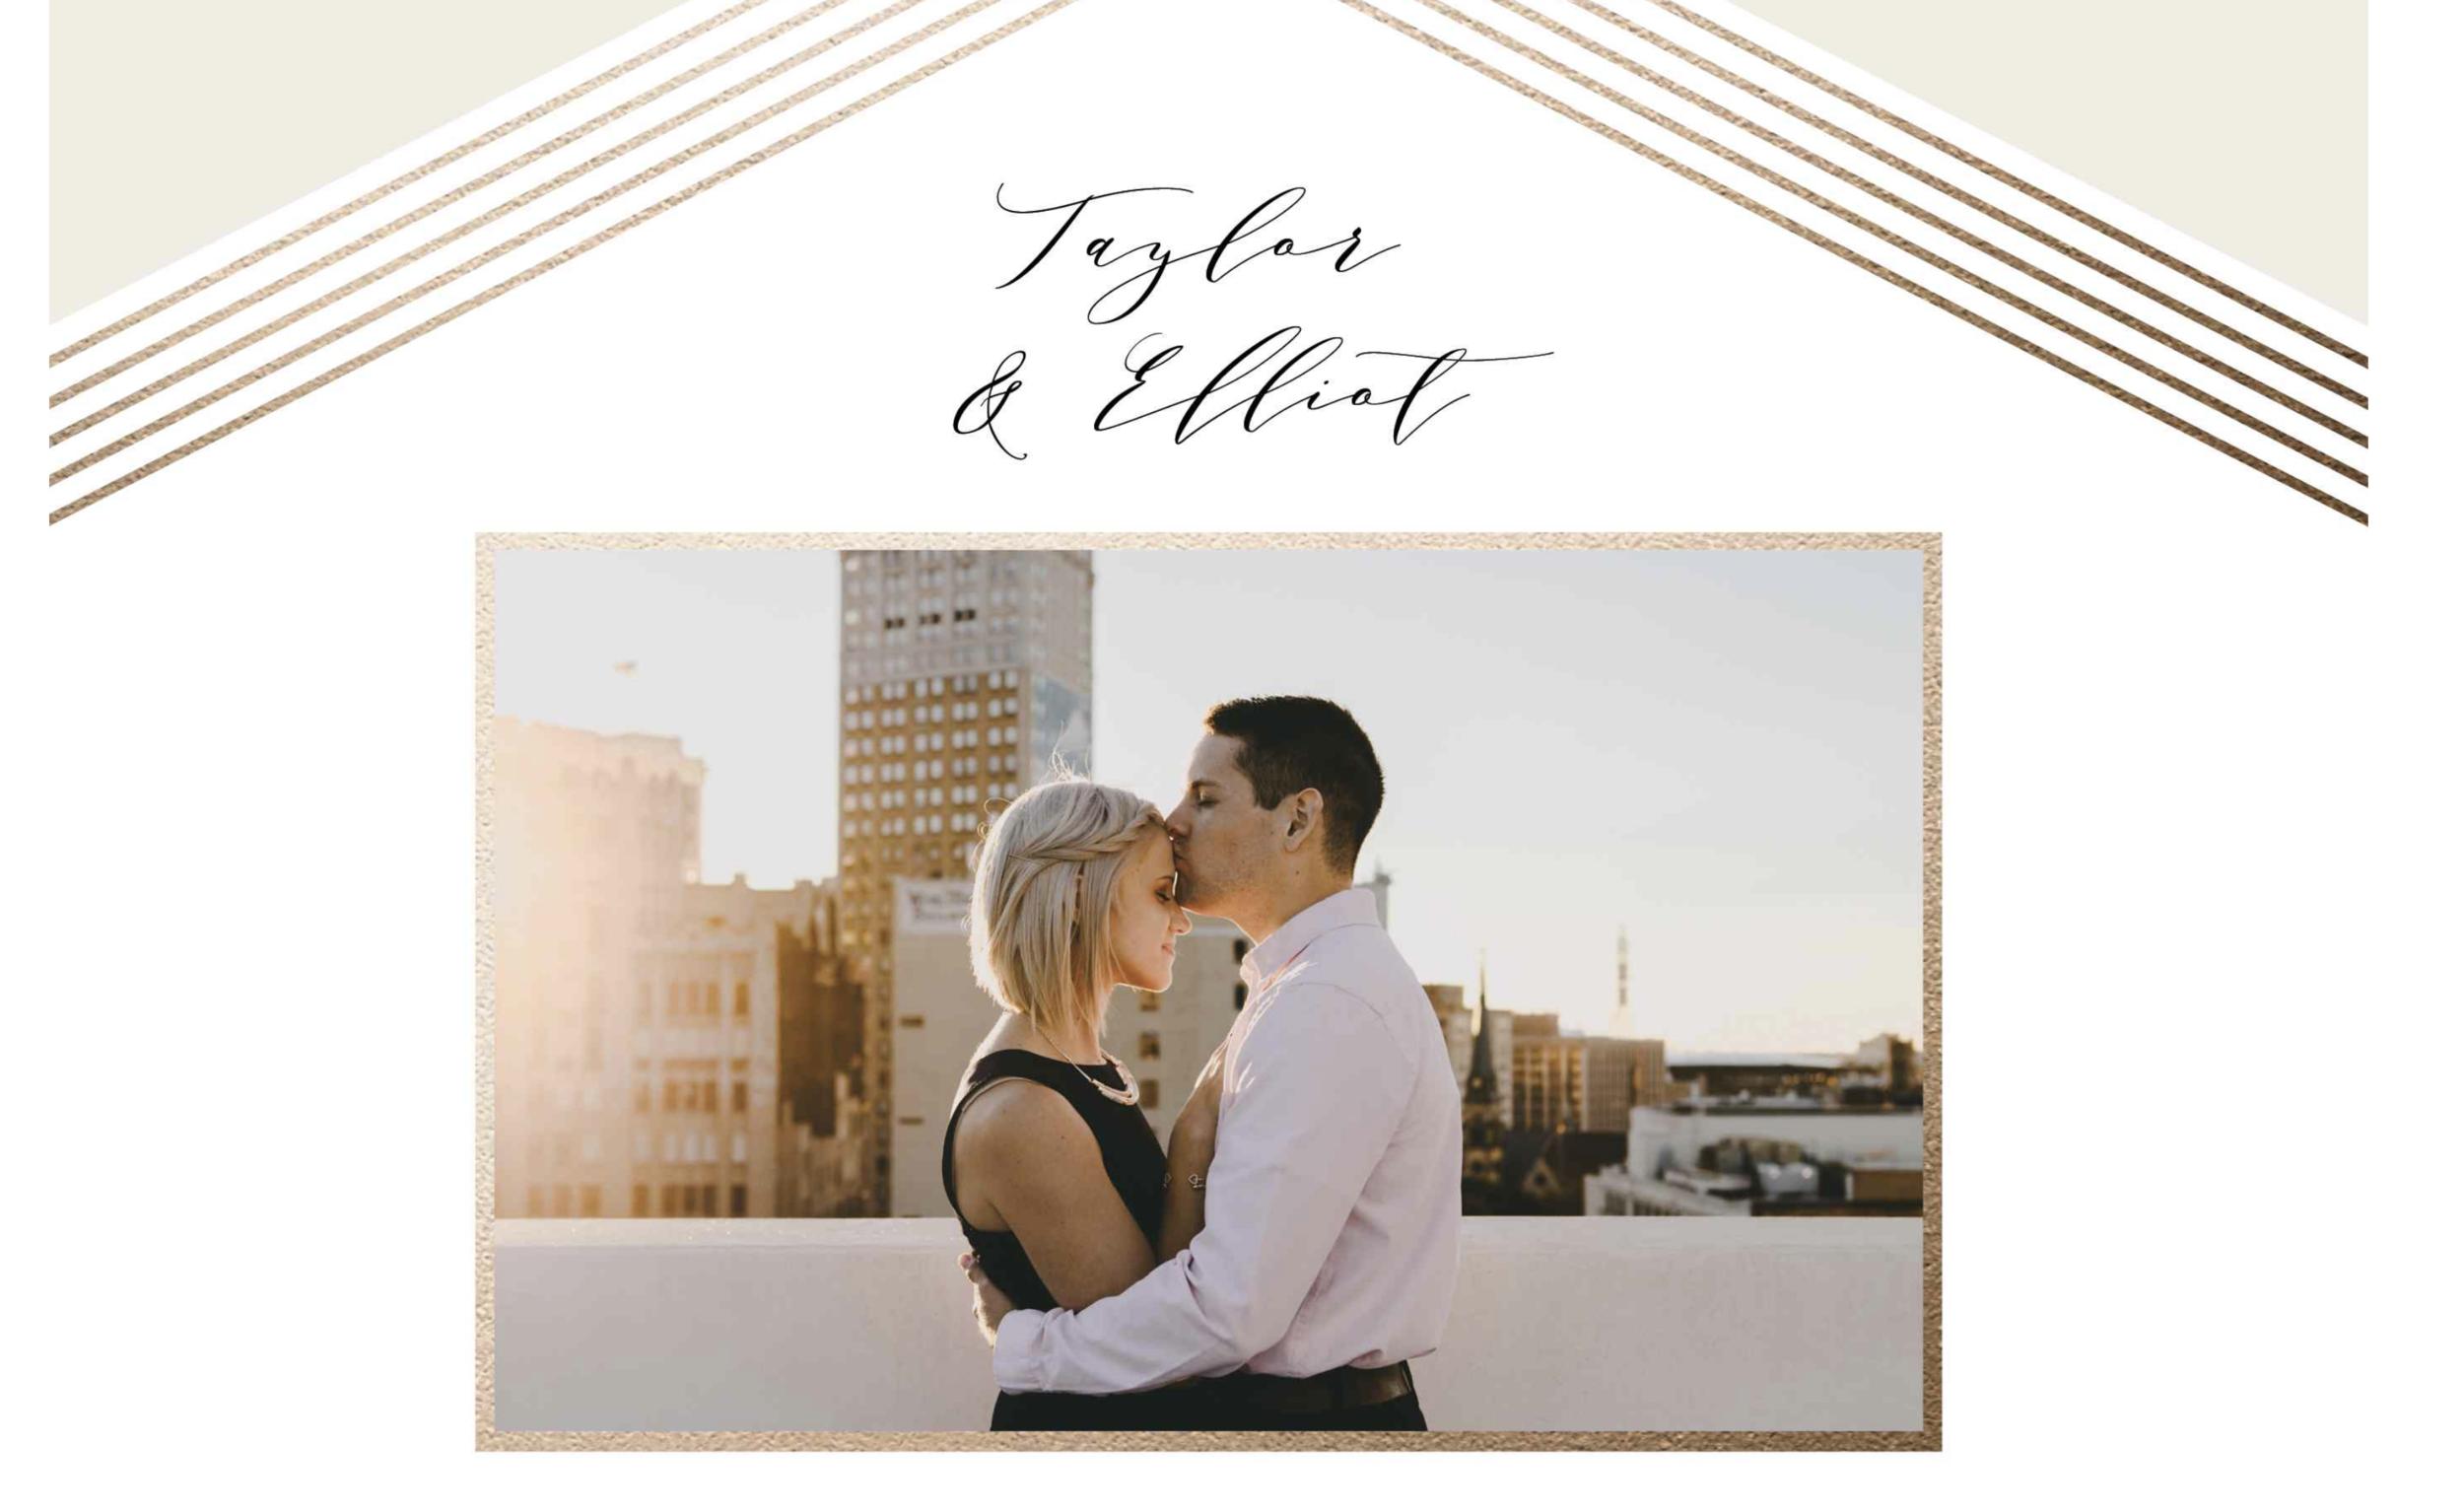 Basic invite wedding website example 1.png